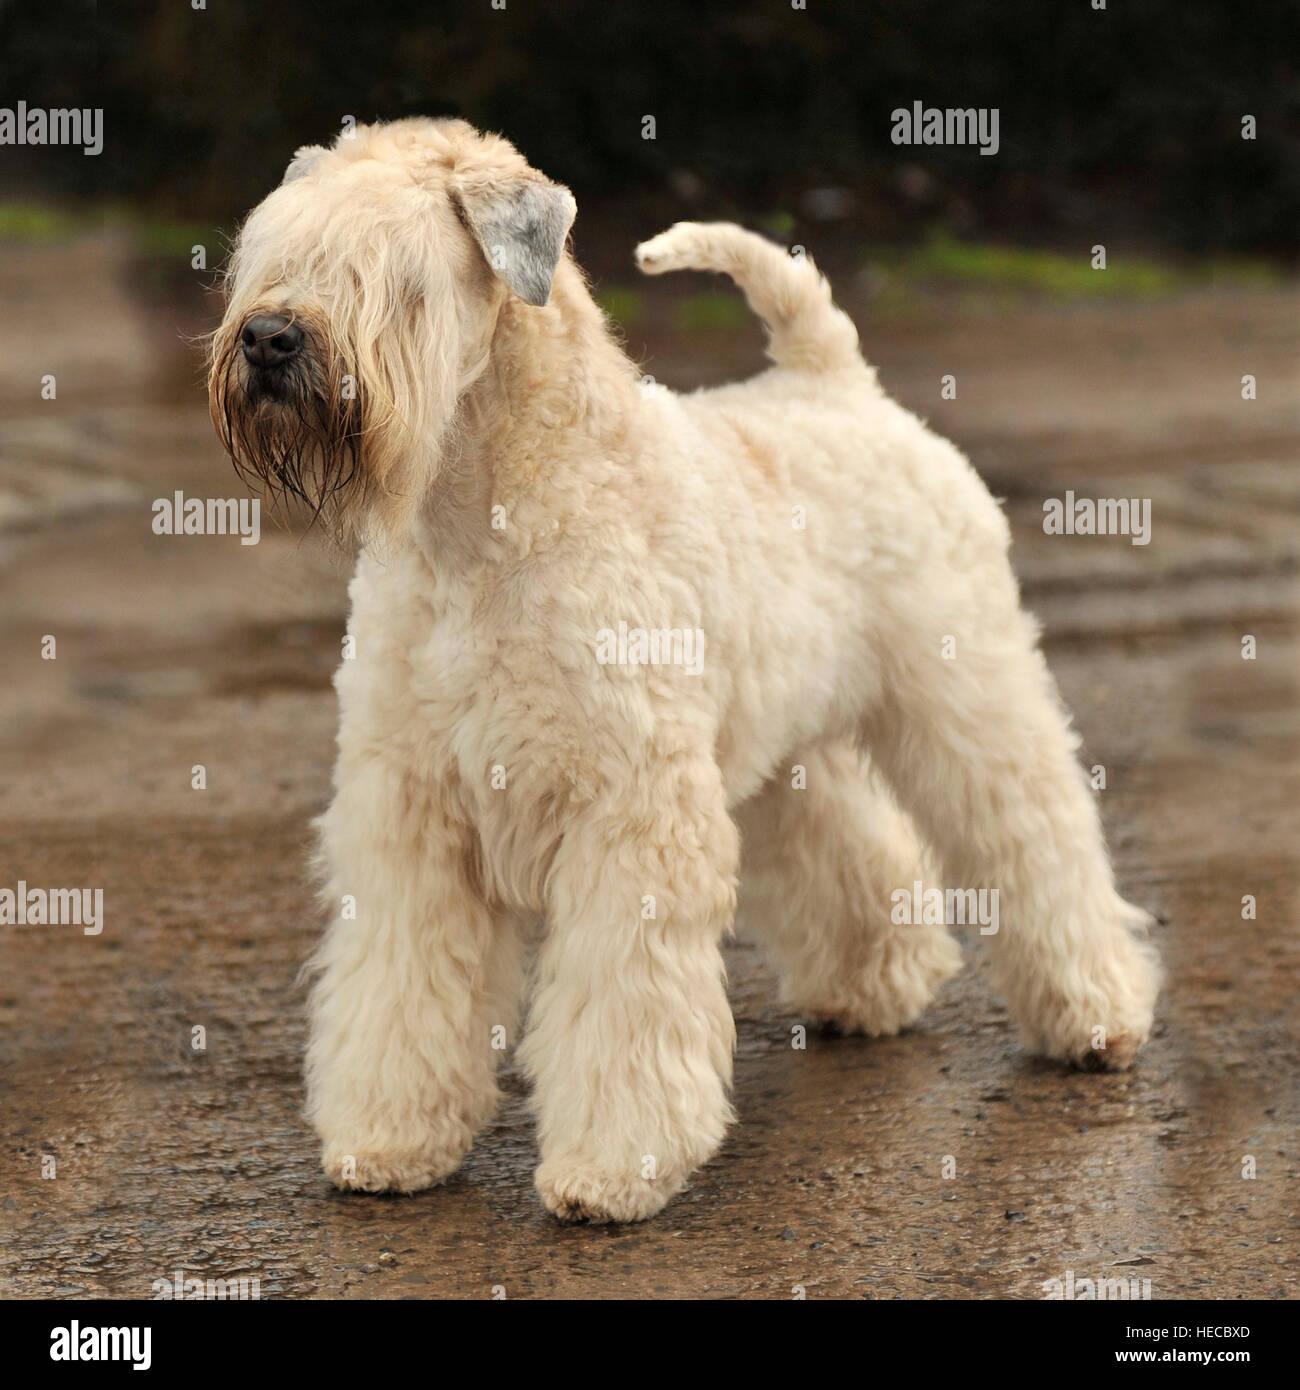 Wheaten Terrier Stock Photos Wheaten Terrier Stock Images Alamy